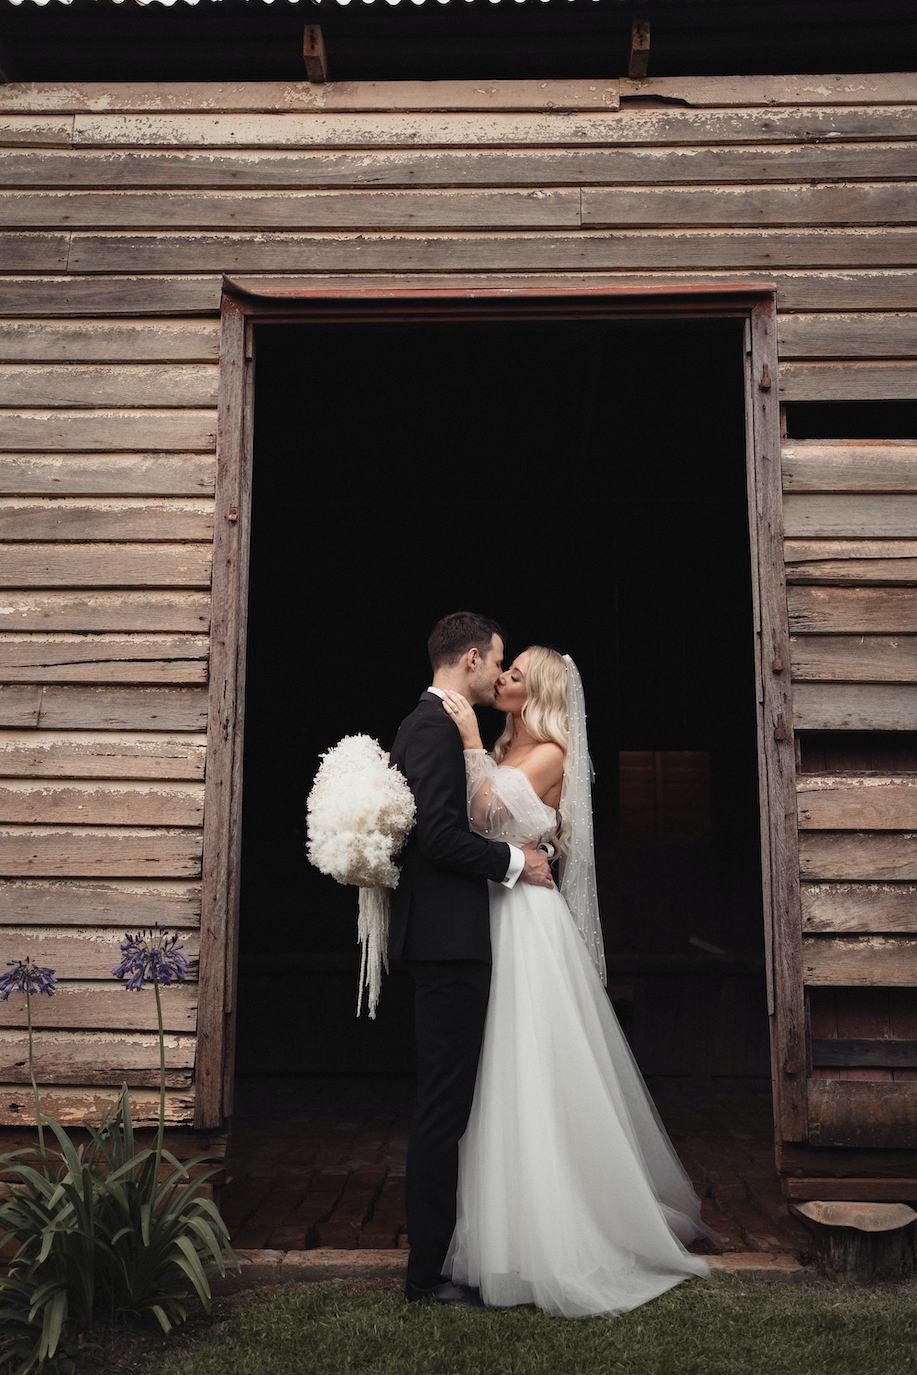 Bride and groom posing in doorway